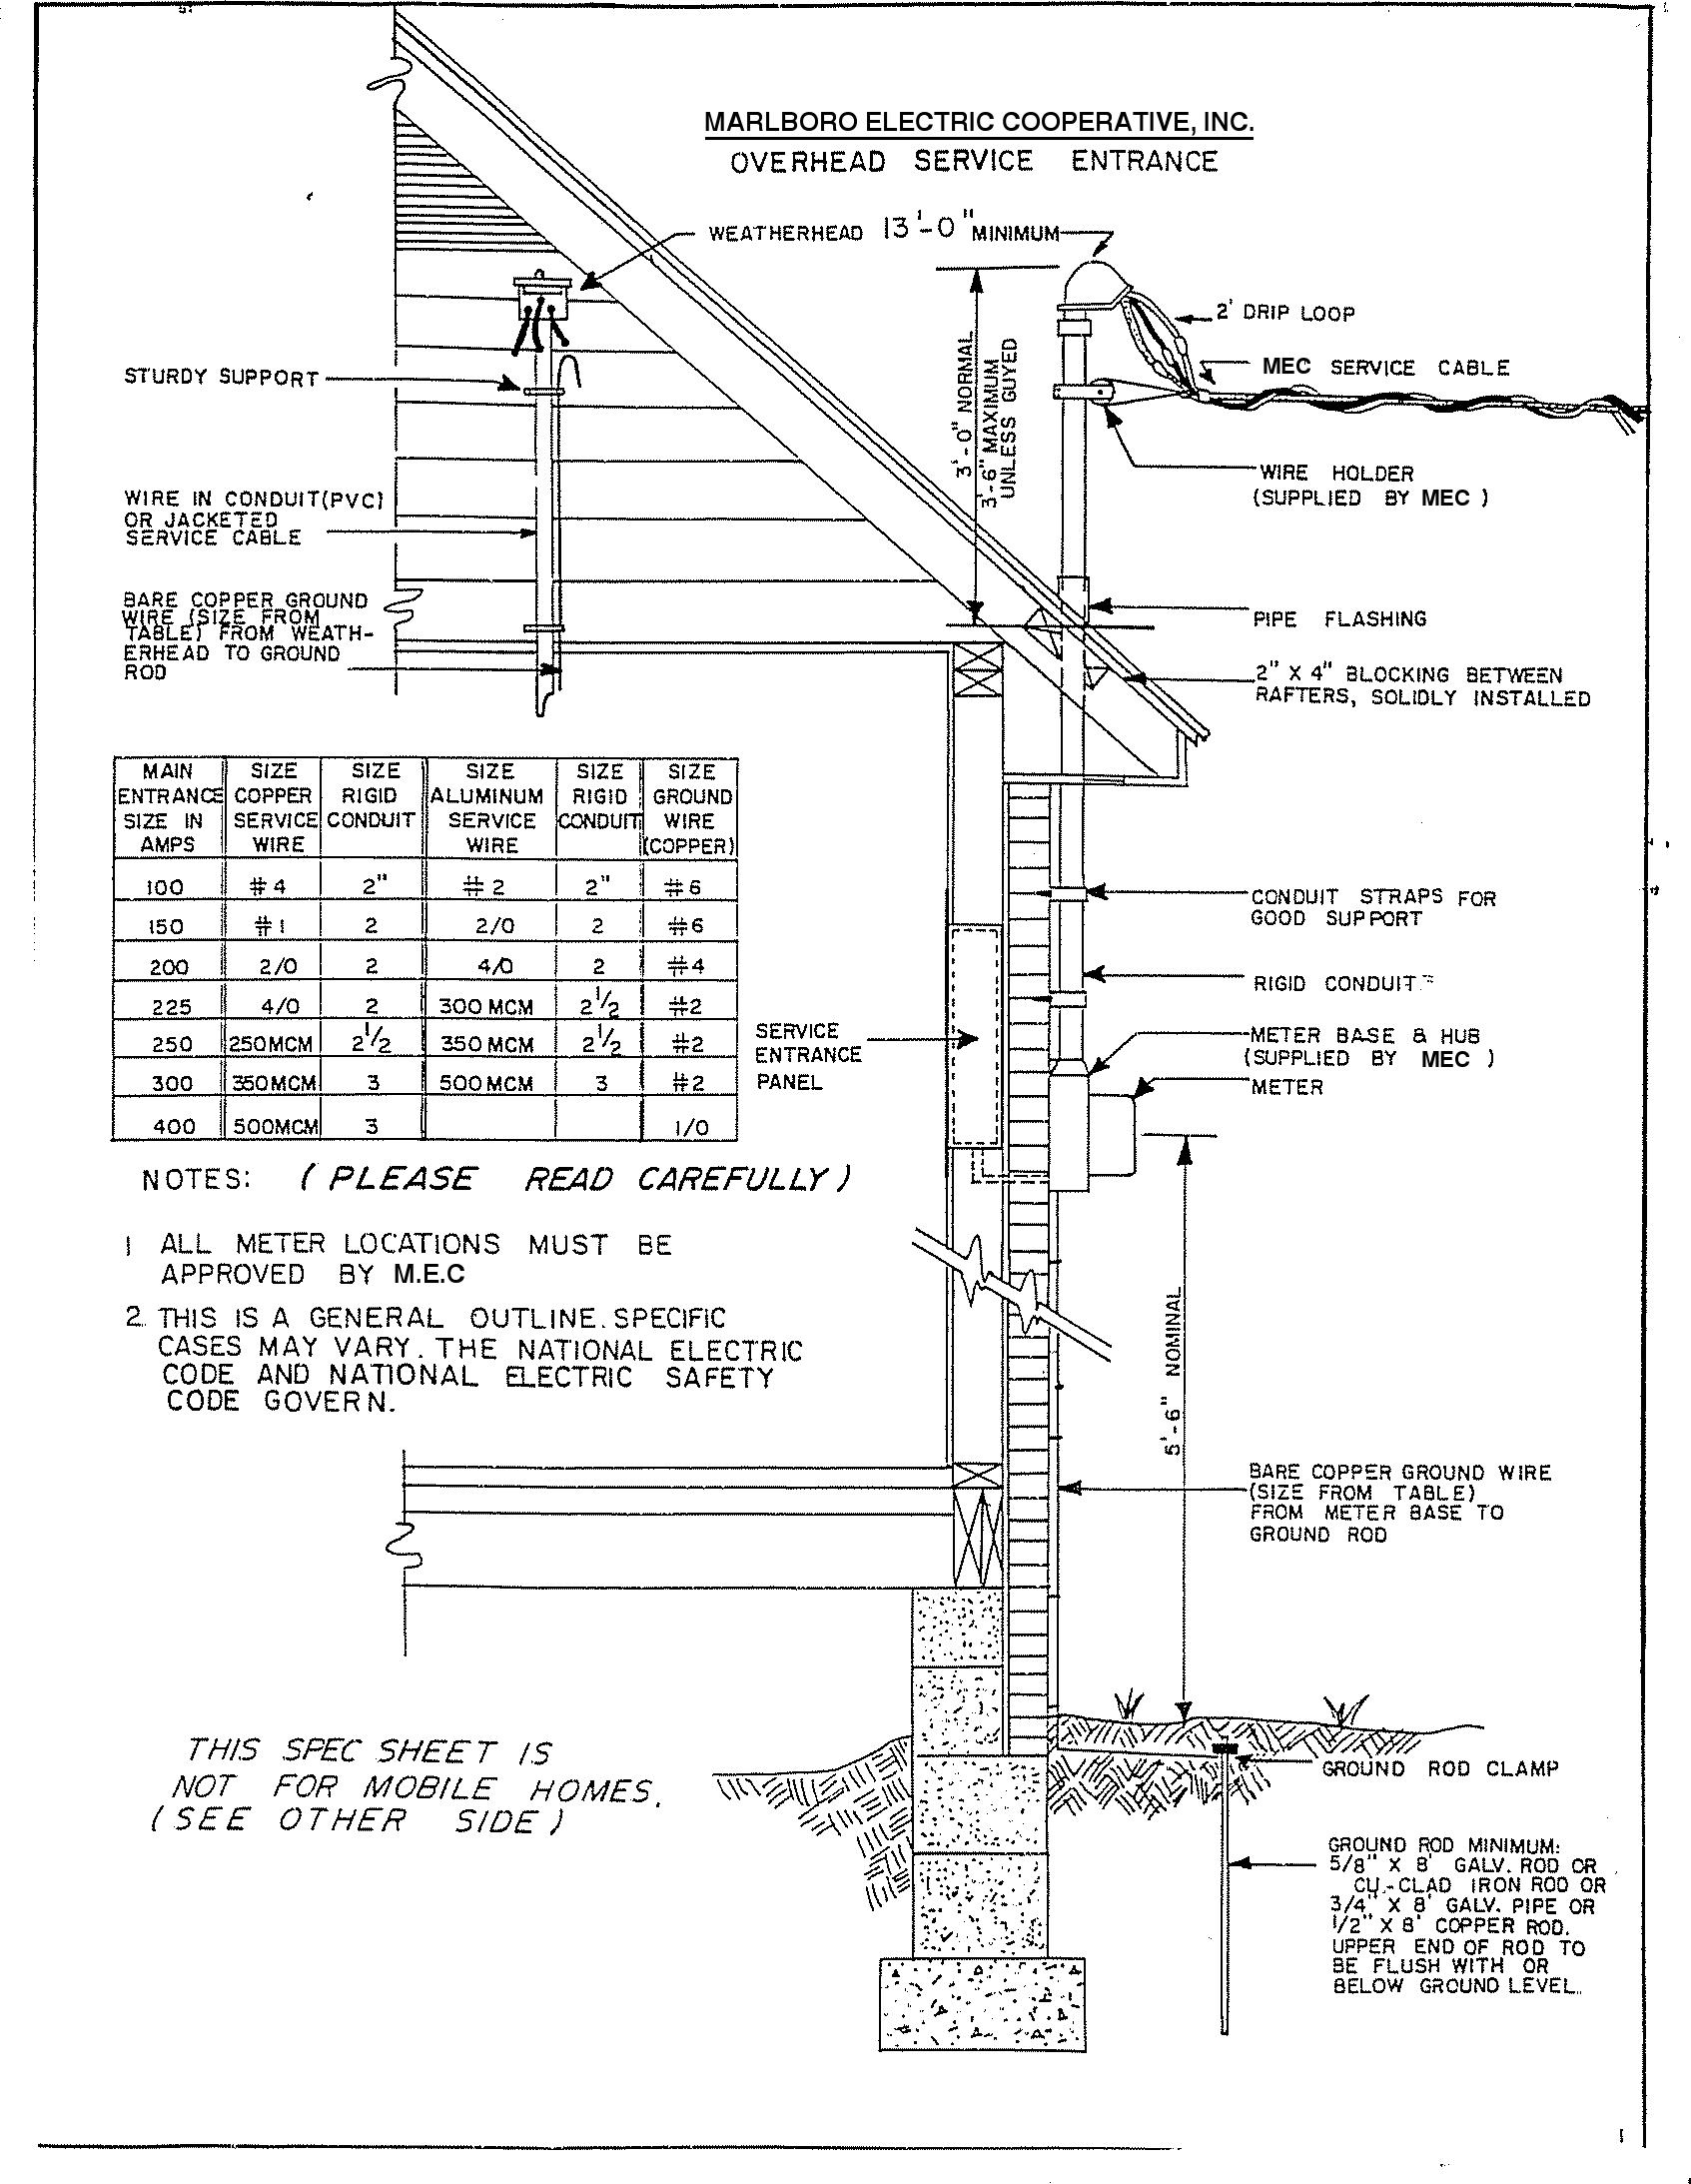 Service Entrance Wiring Diagram